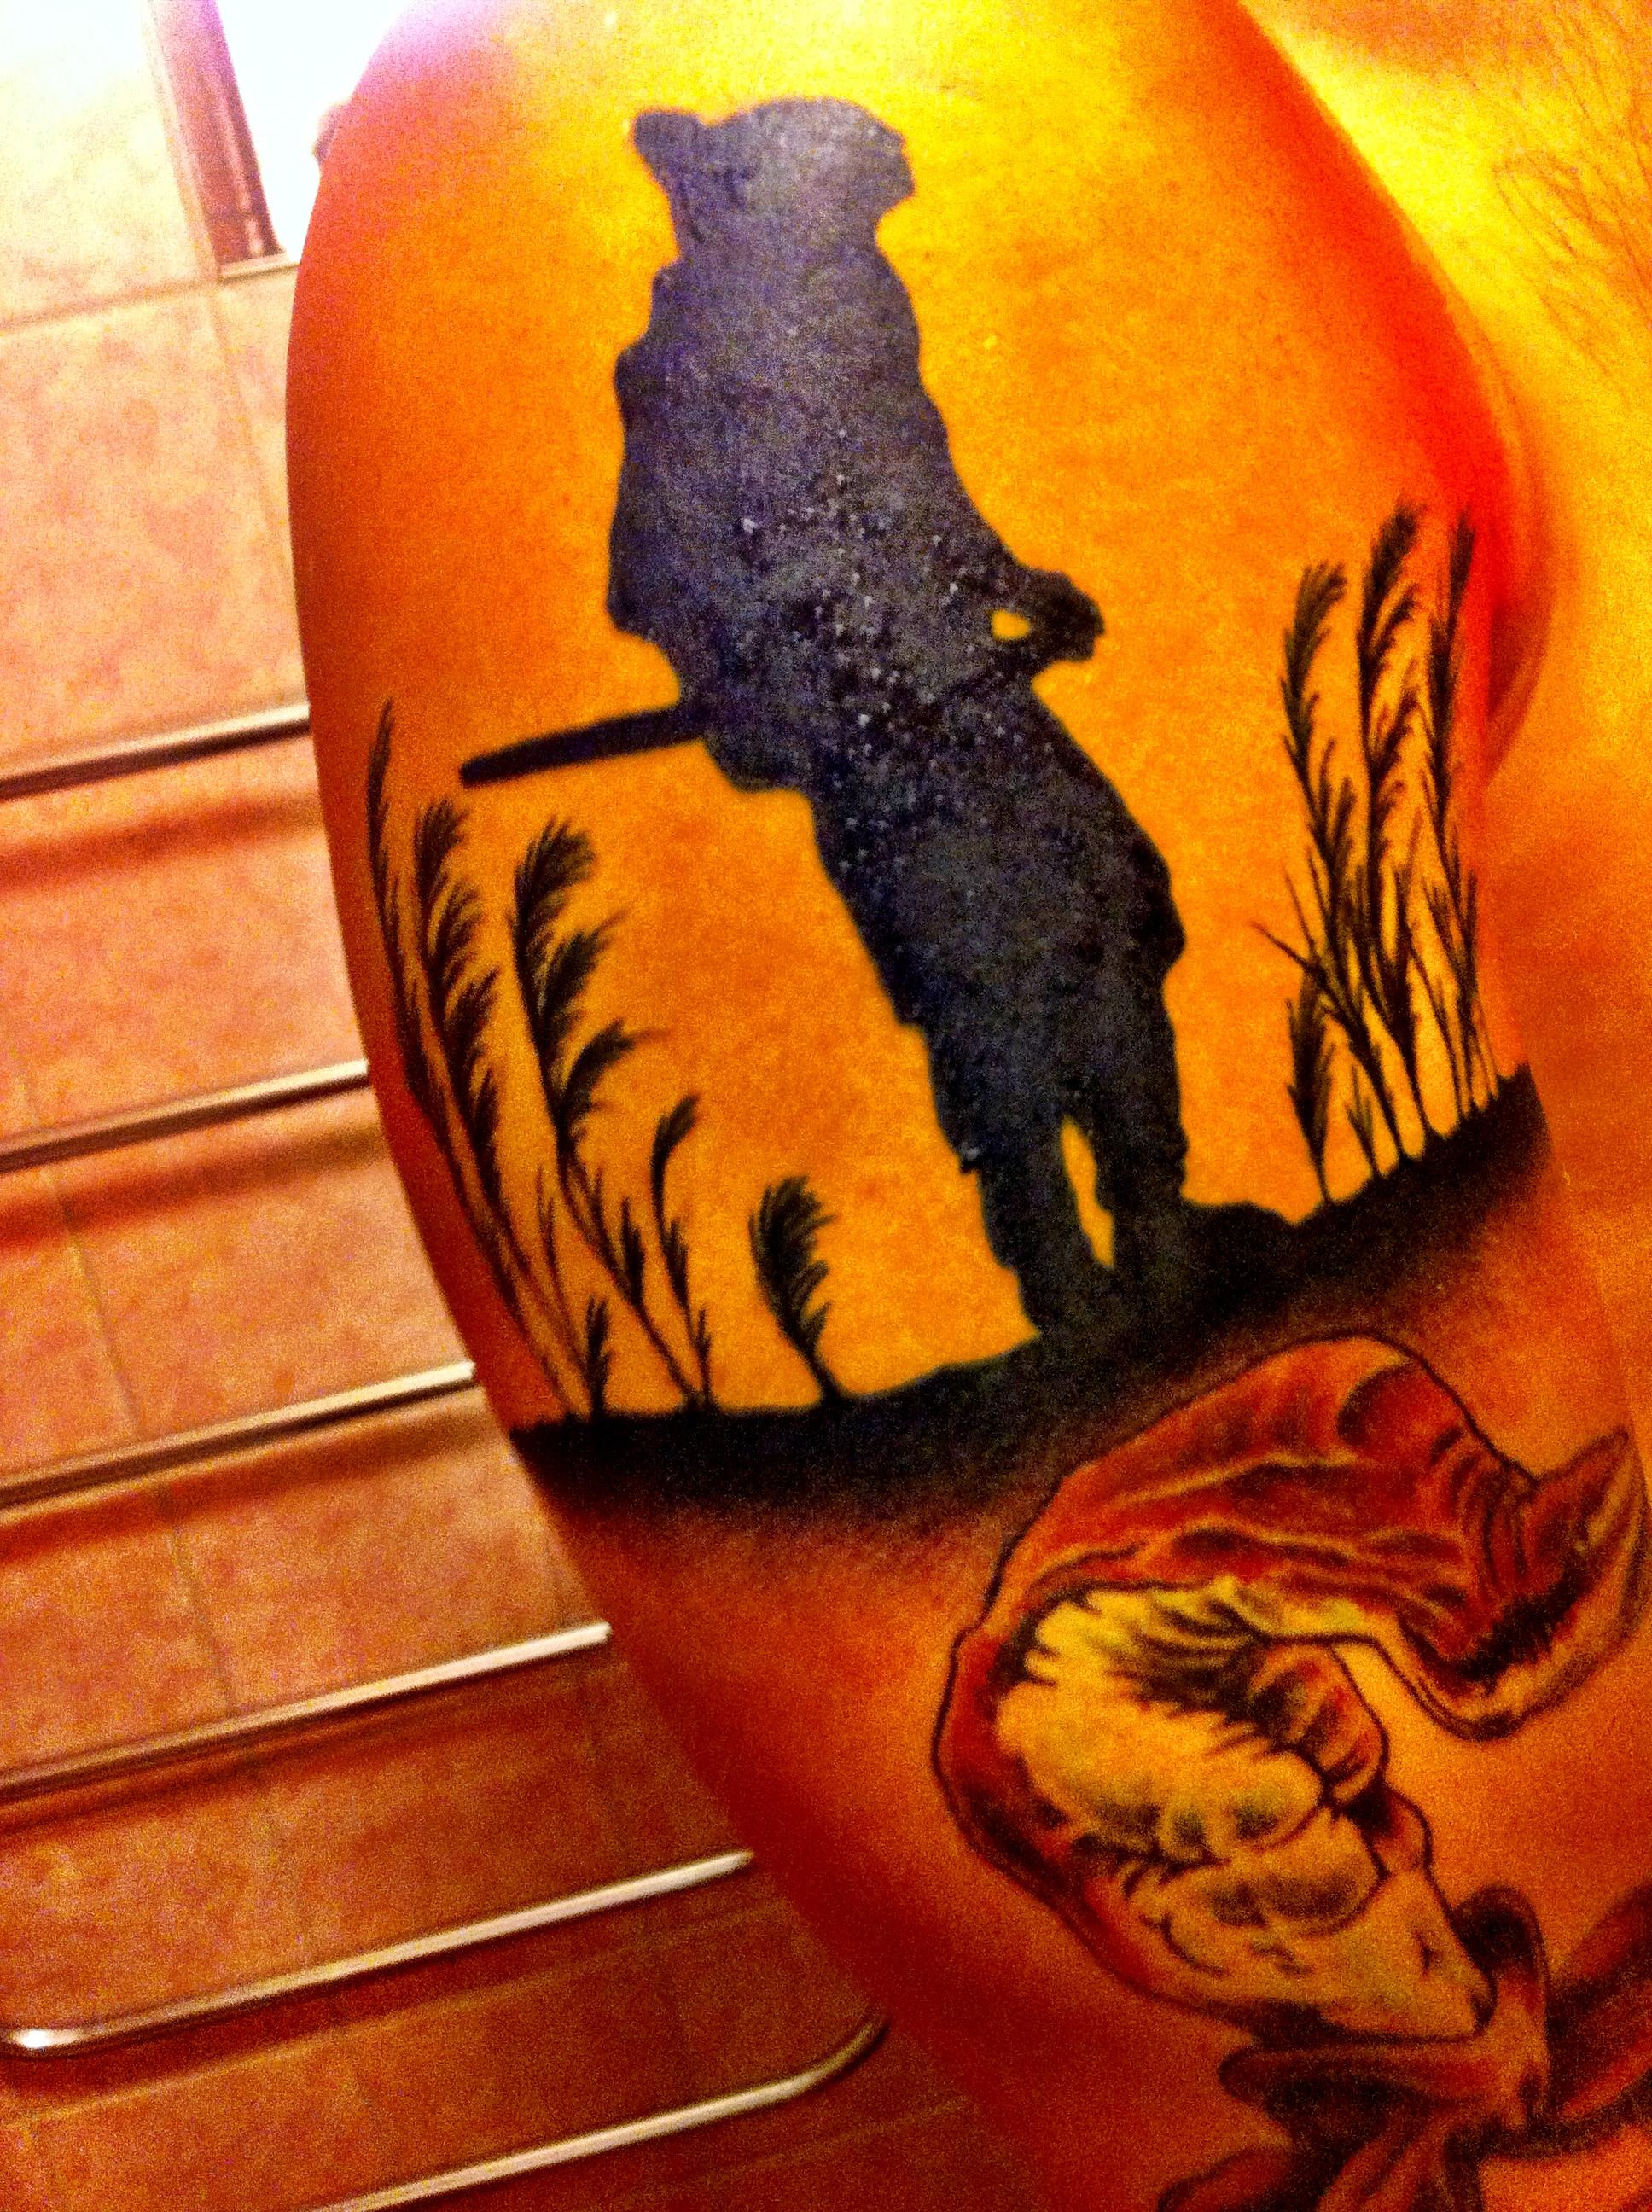 tatuering i armhålan